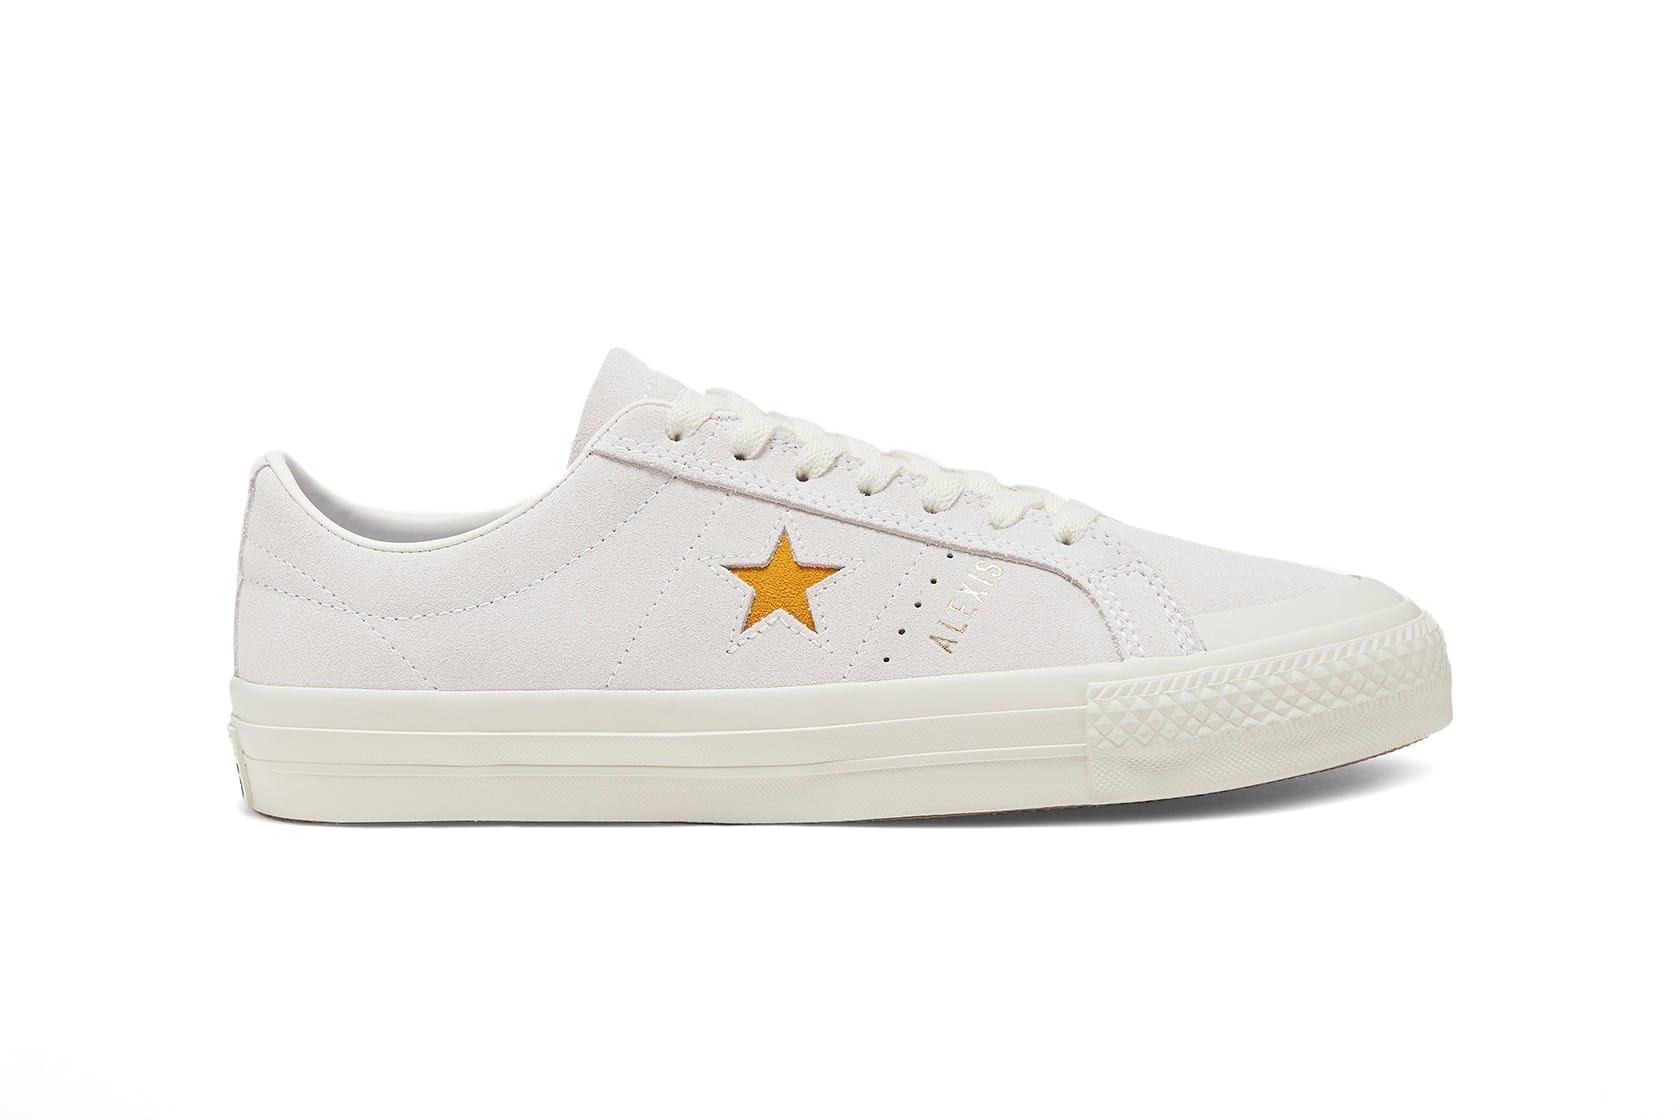 Alexis Sablone x Converse One Star Pro